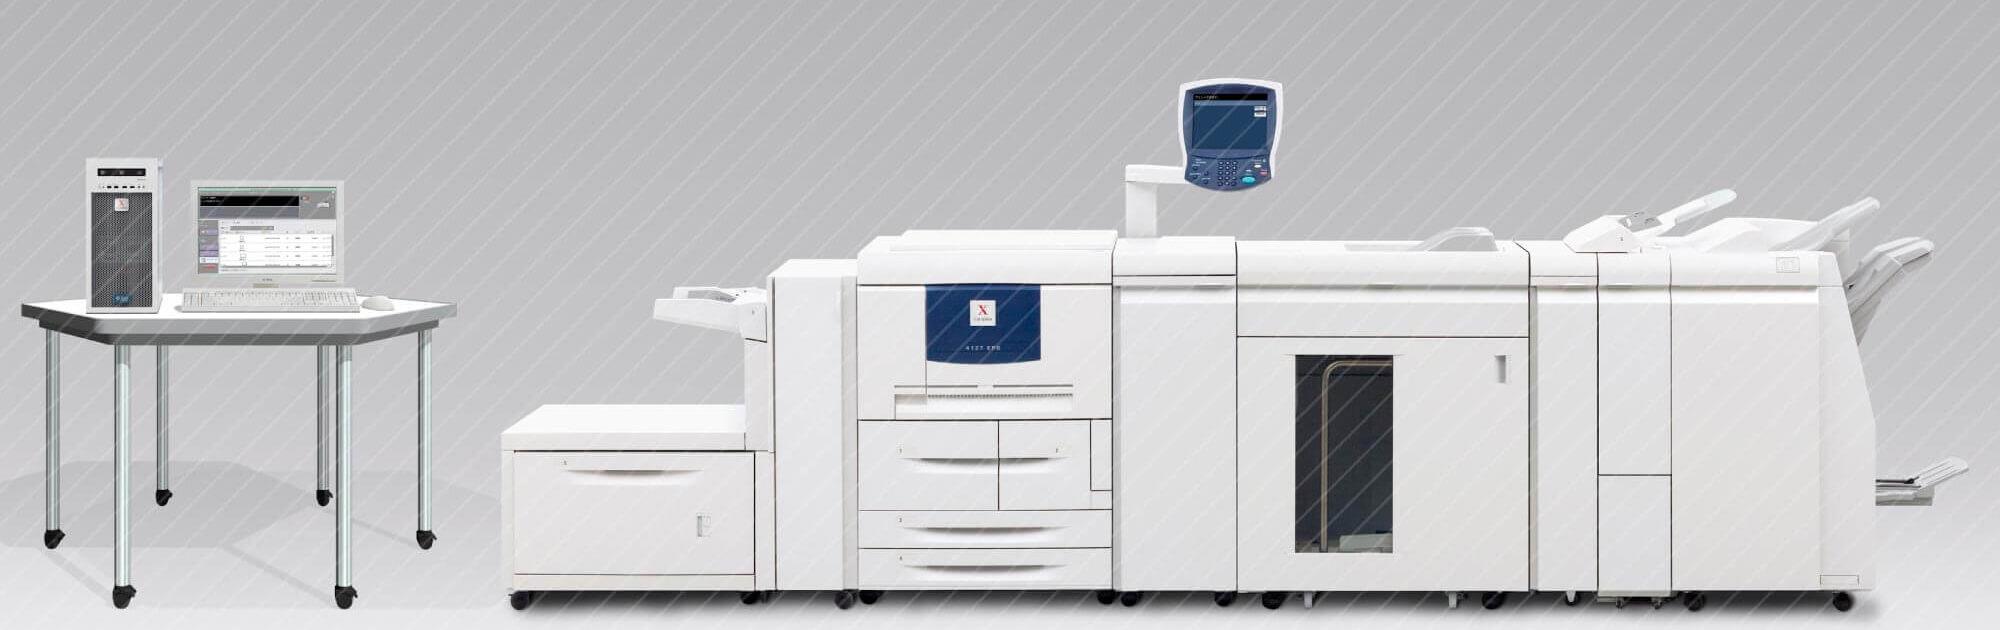 ALT - Adelaide Printers - Keystone Printing